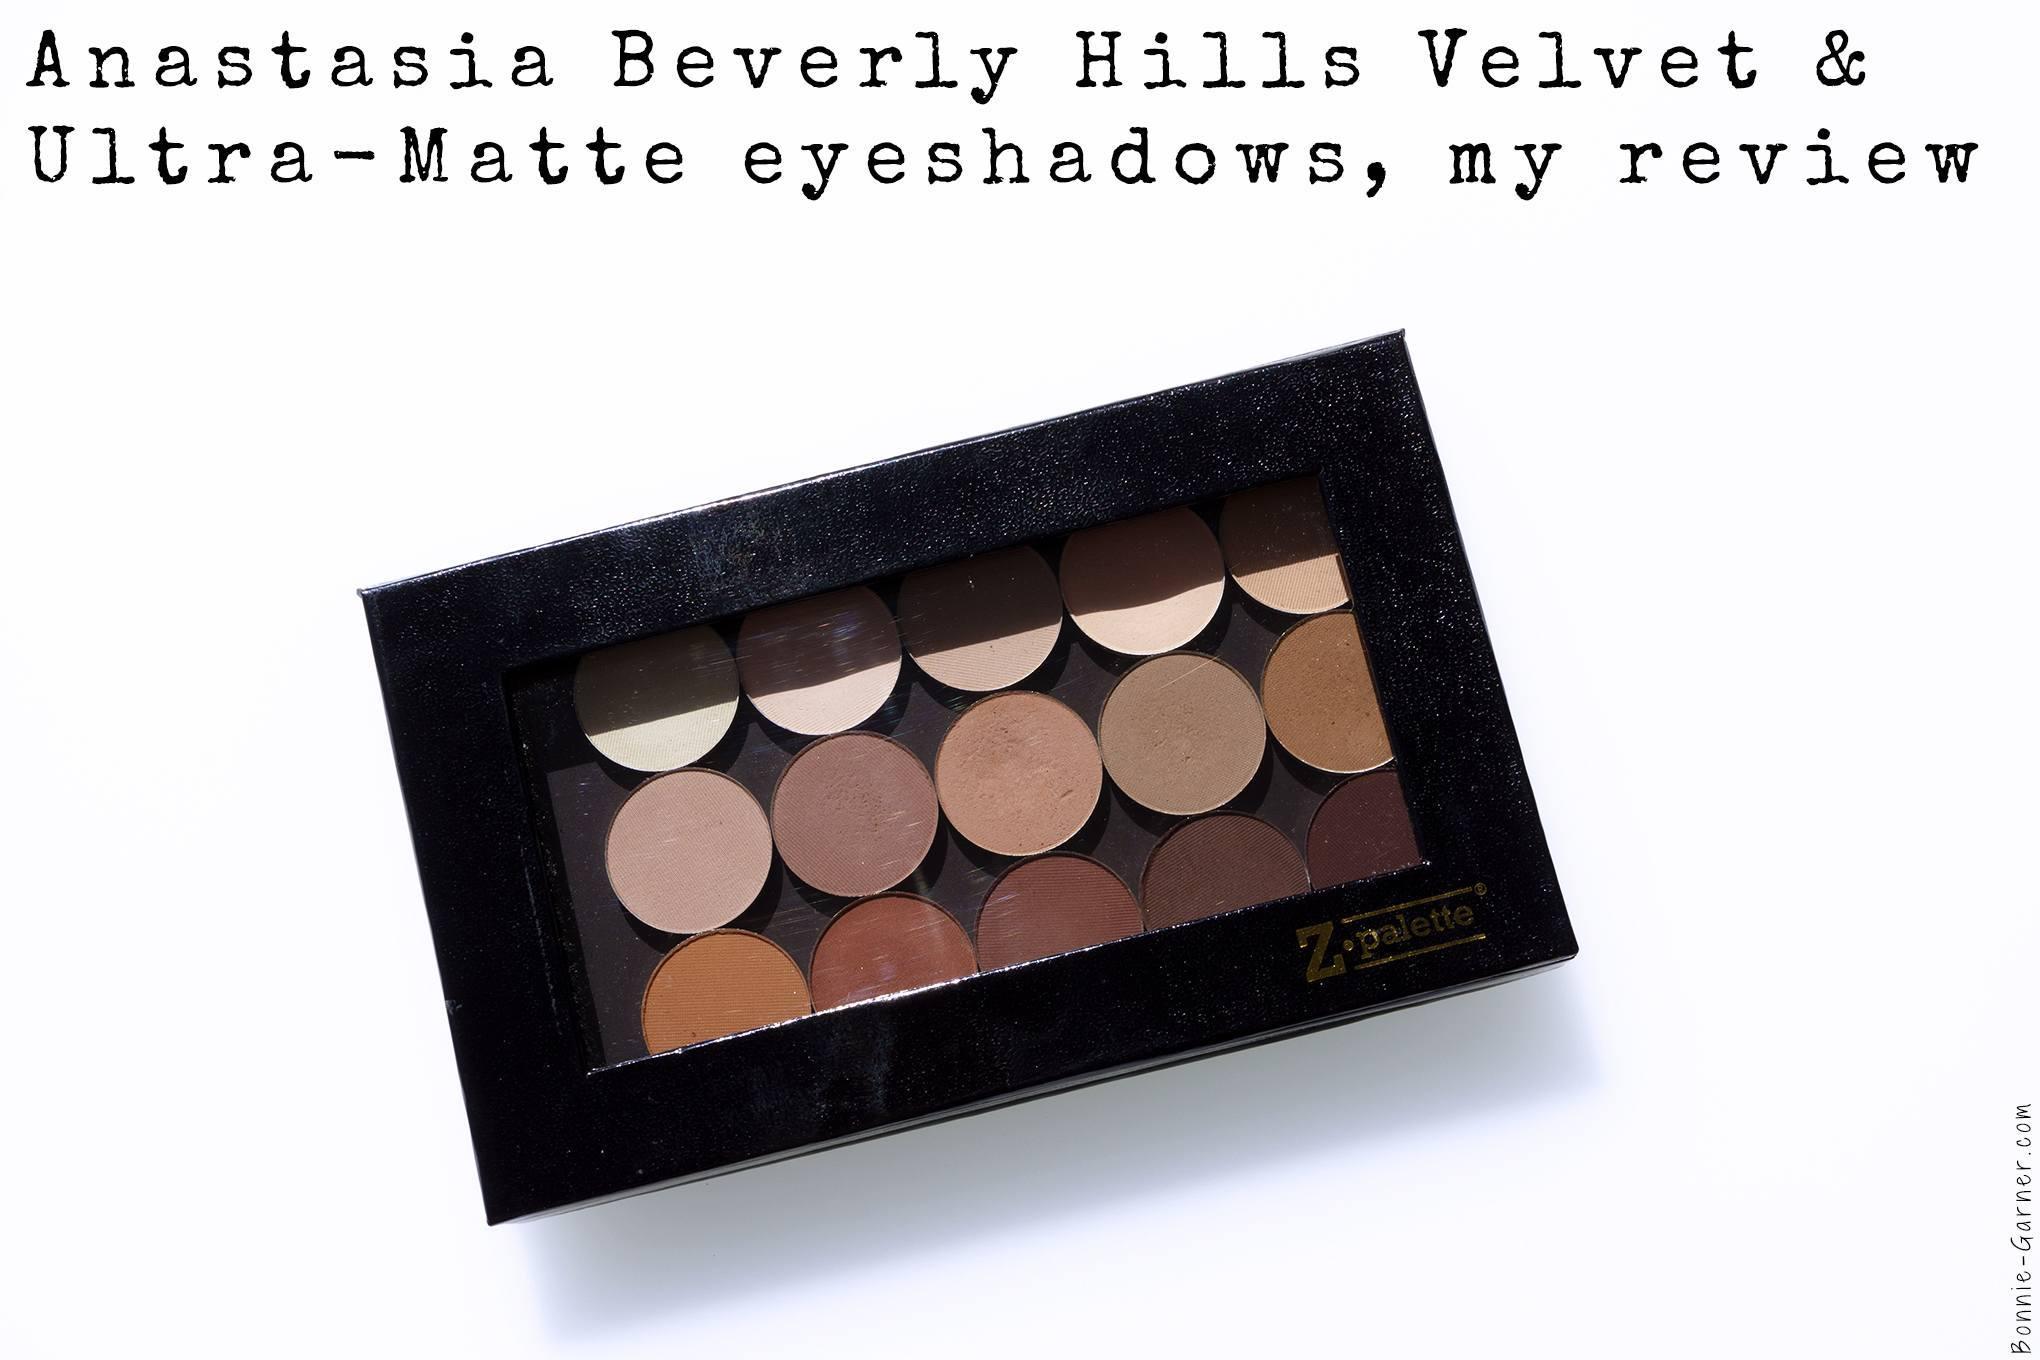 Anastasia Beverly Hills Velvet & Ultra-Matte eyeshadows, my review